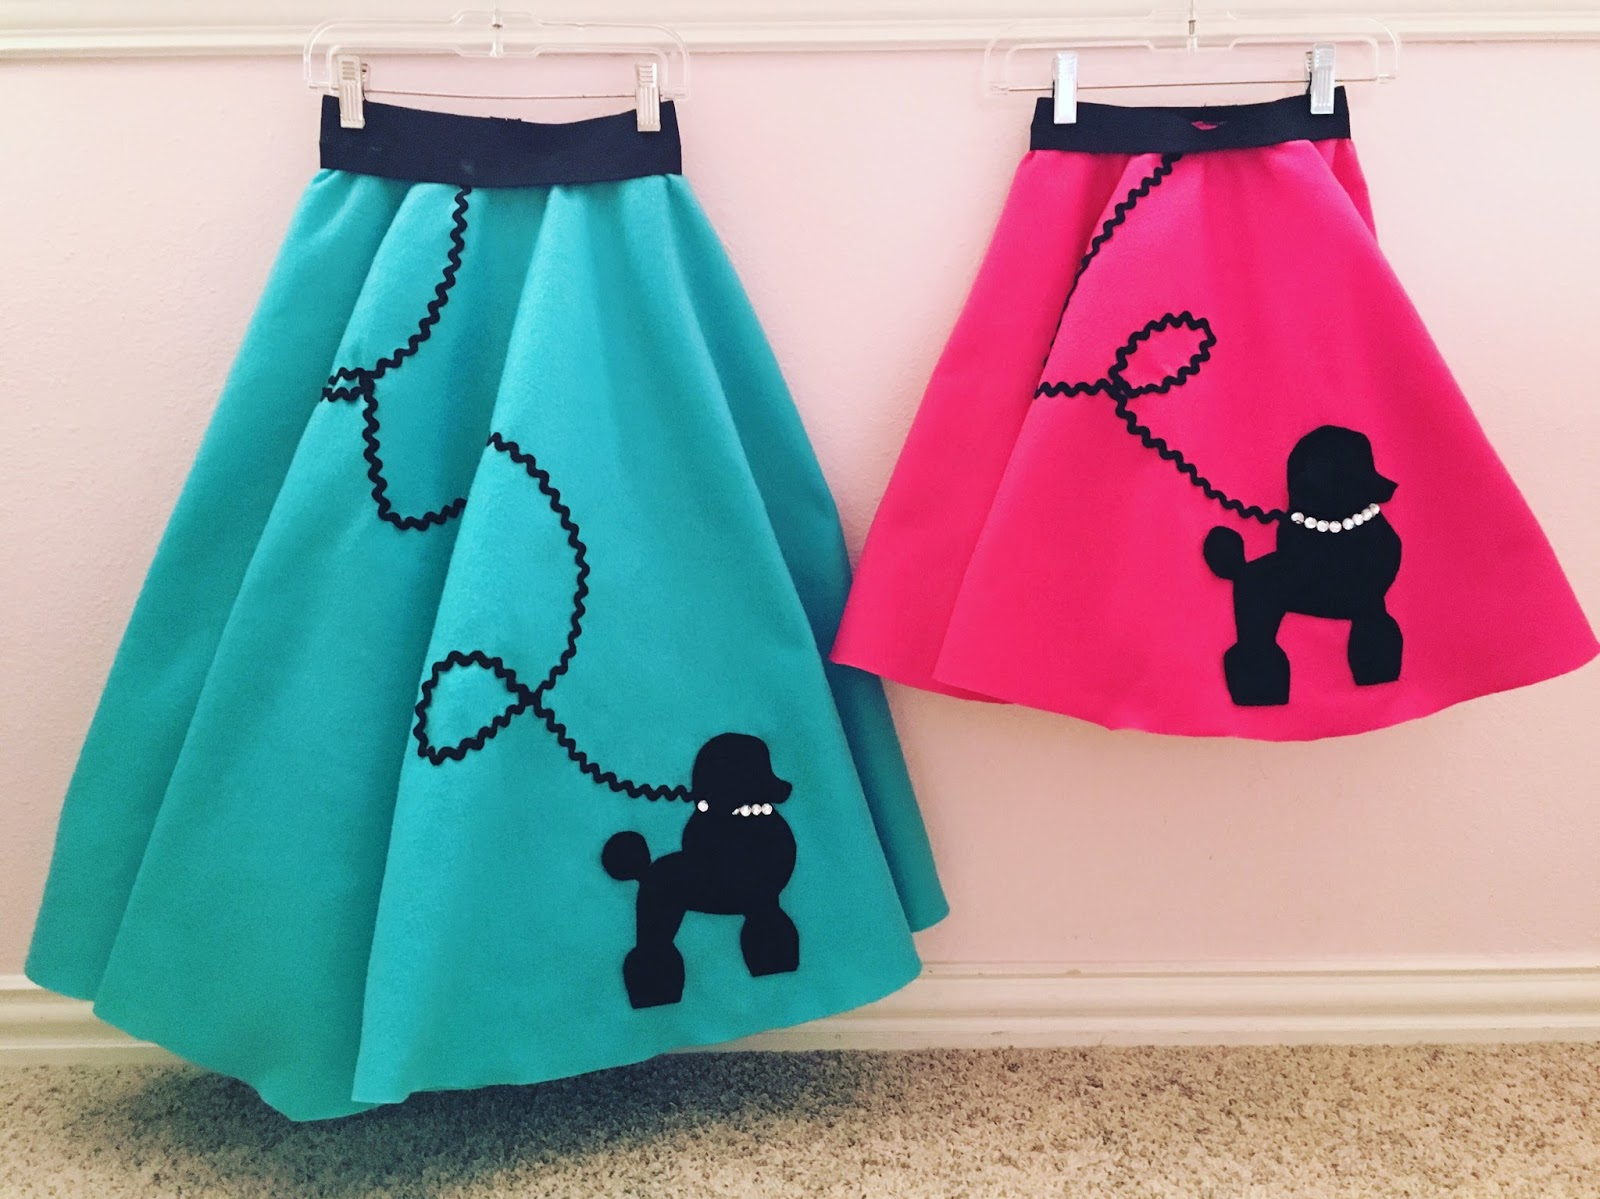 & Crafty Texas Girls: DIY Poodle Skirt